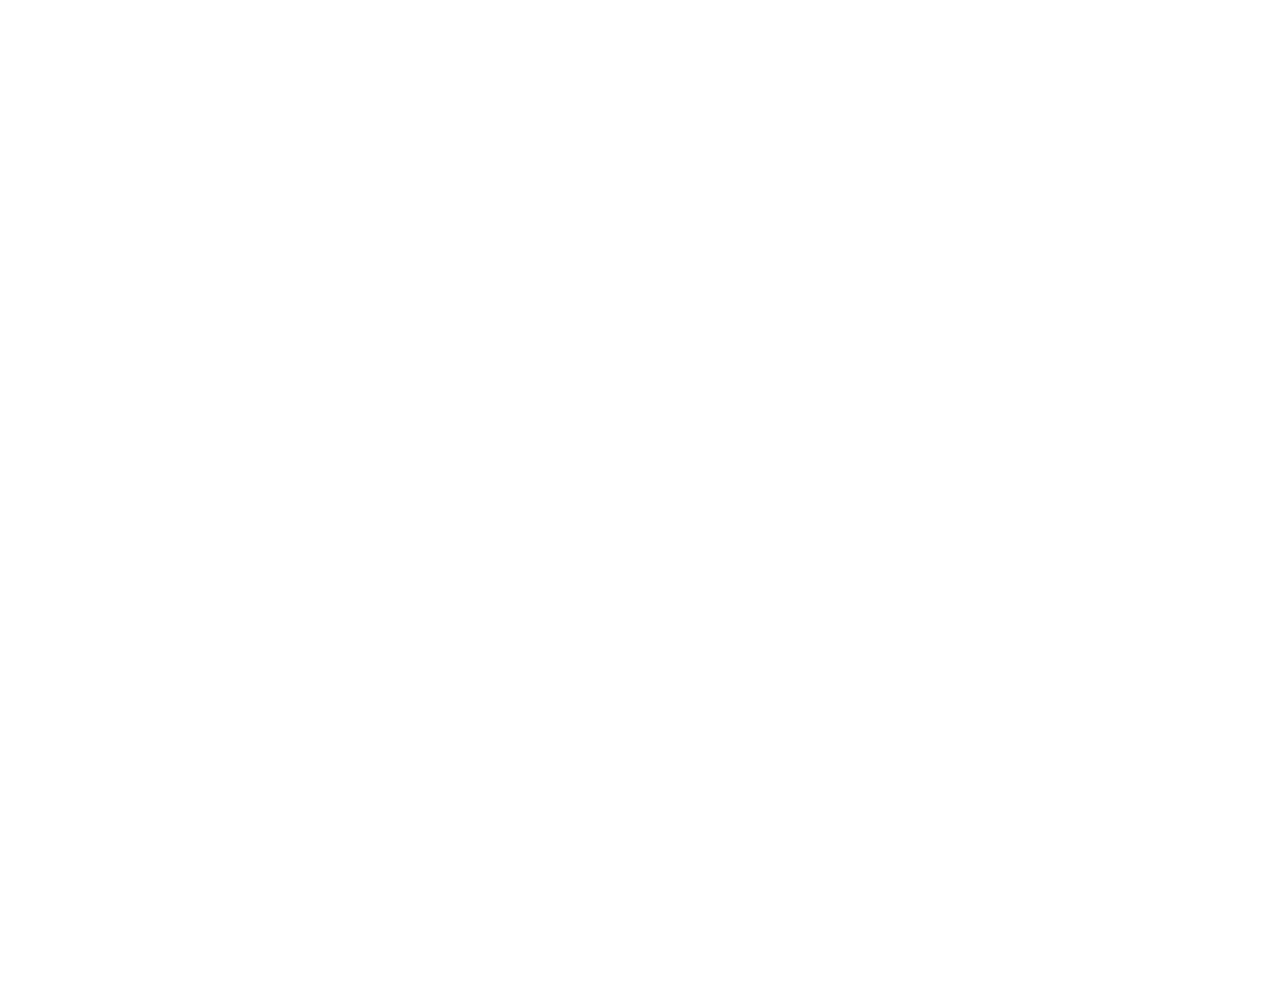 Hide Detailing